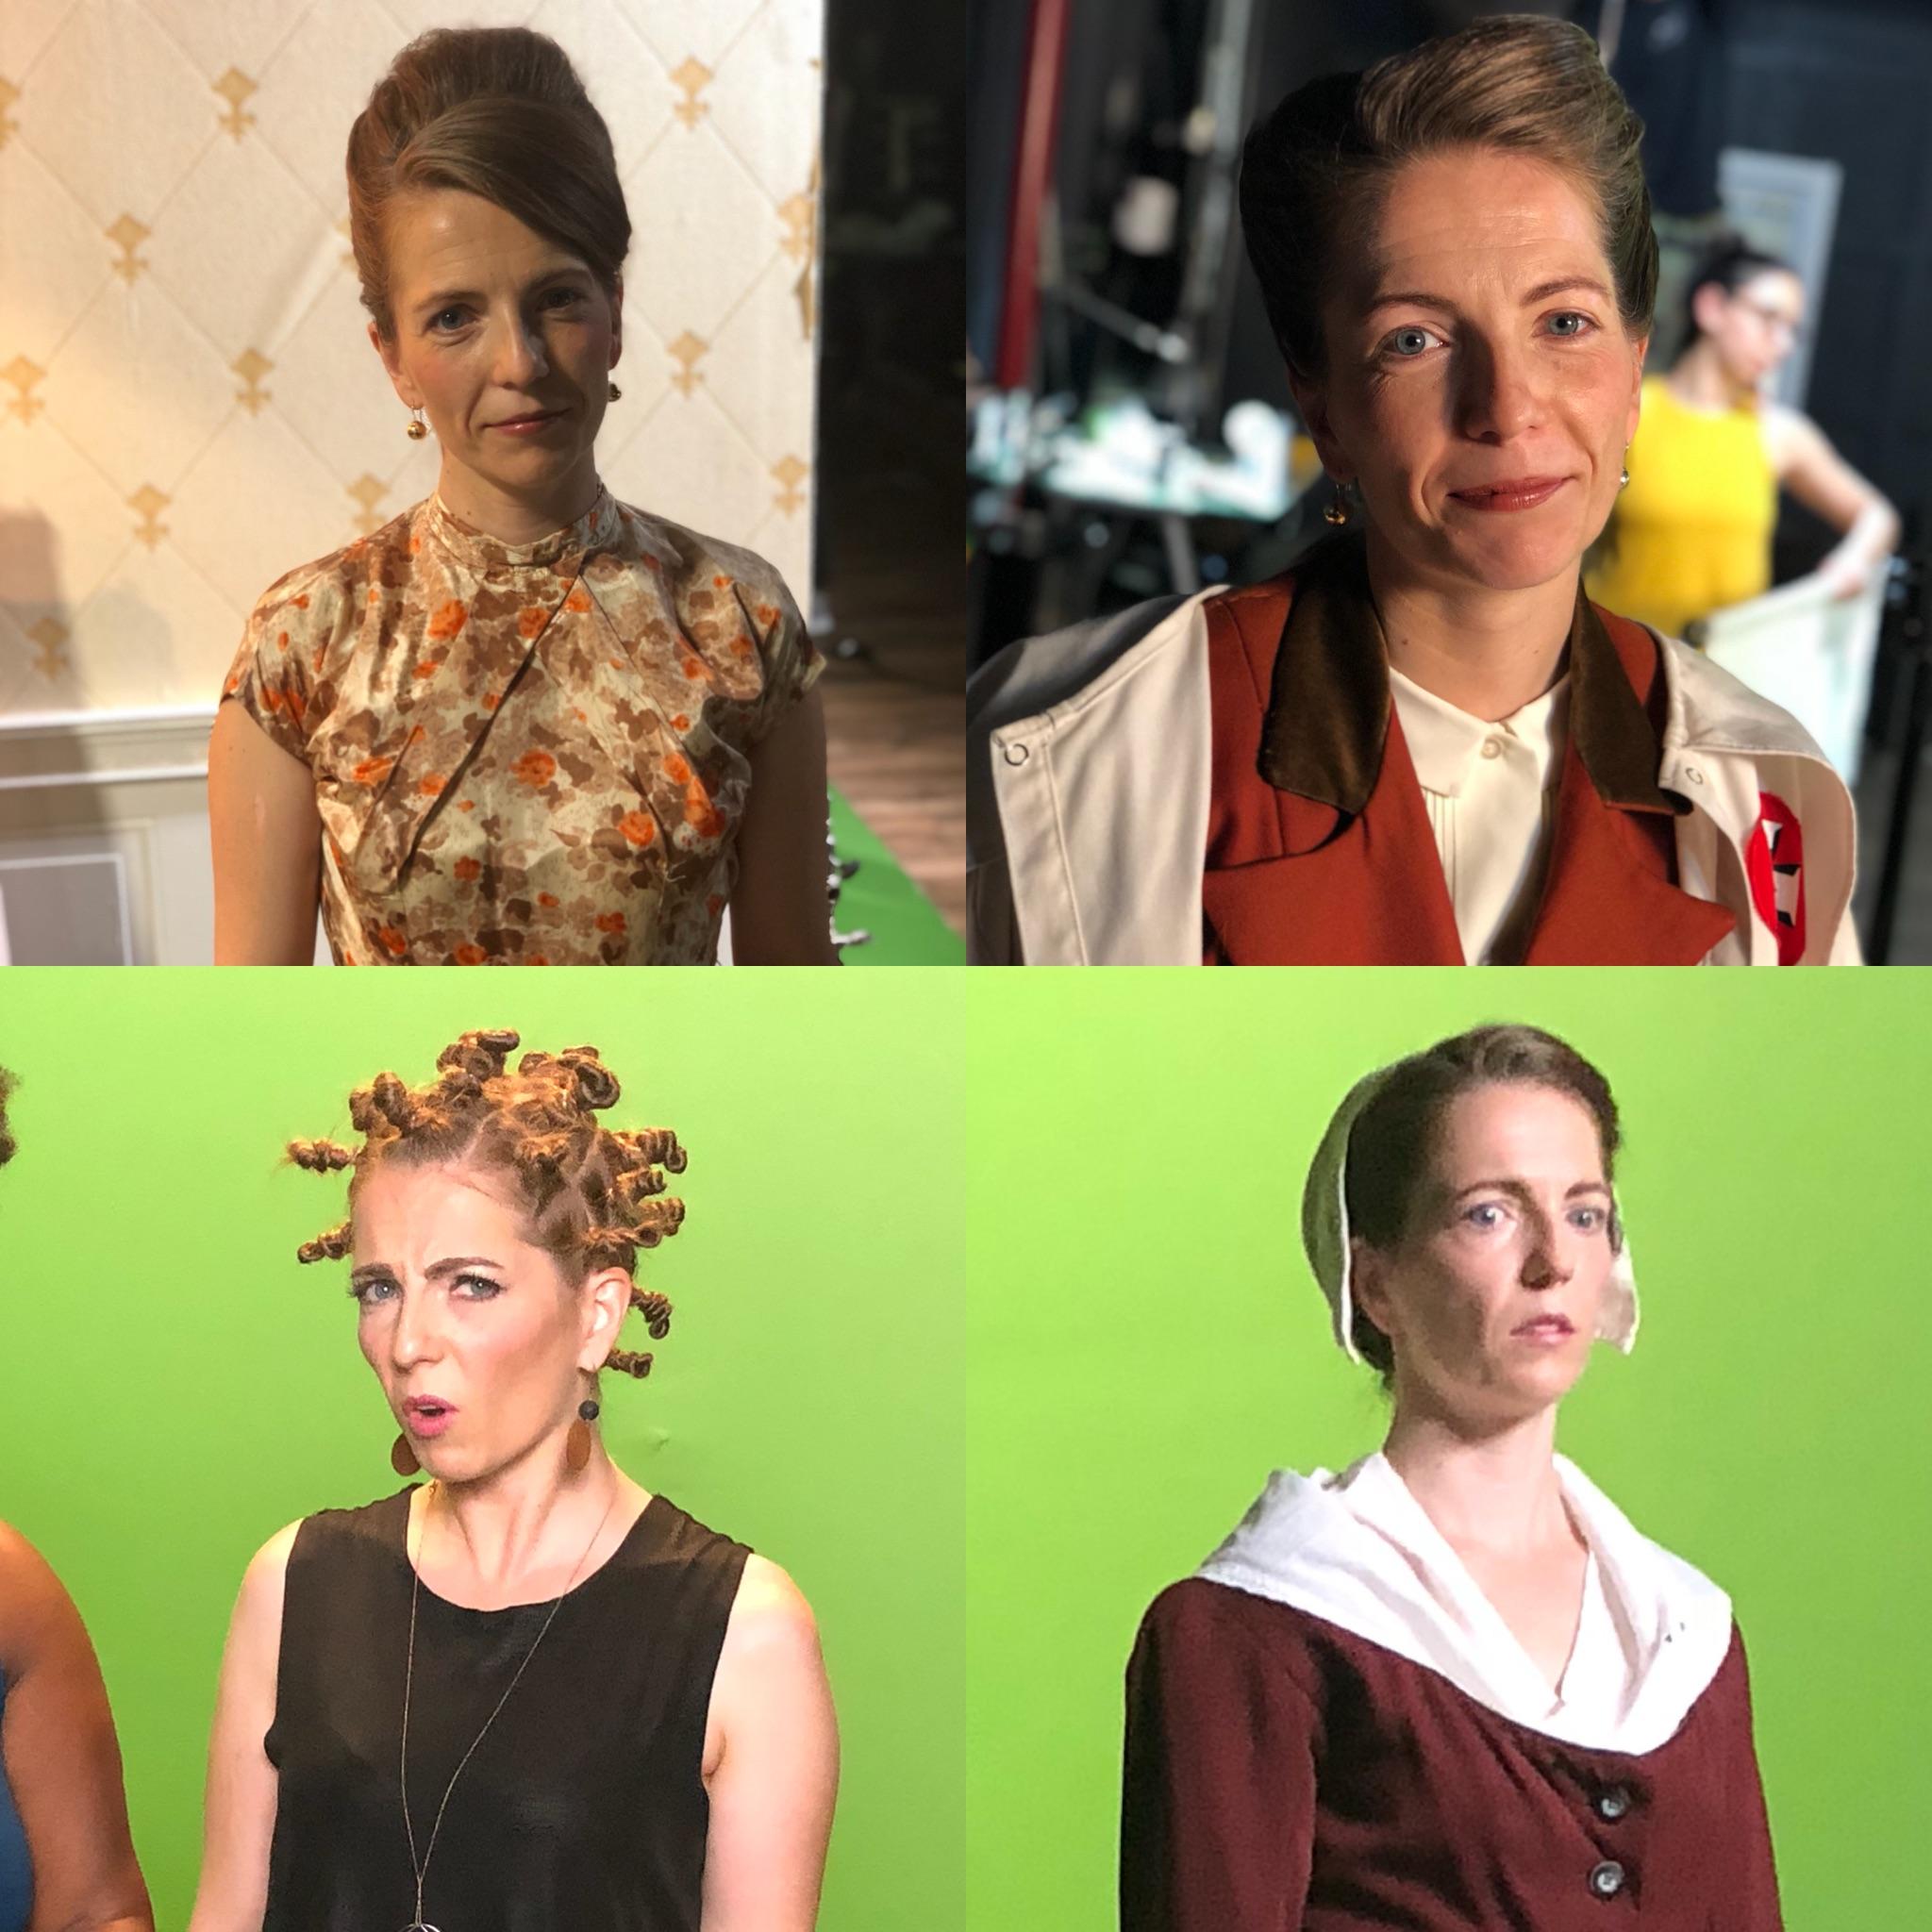 Eevin Hartsough as a handfull of Beckys